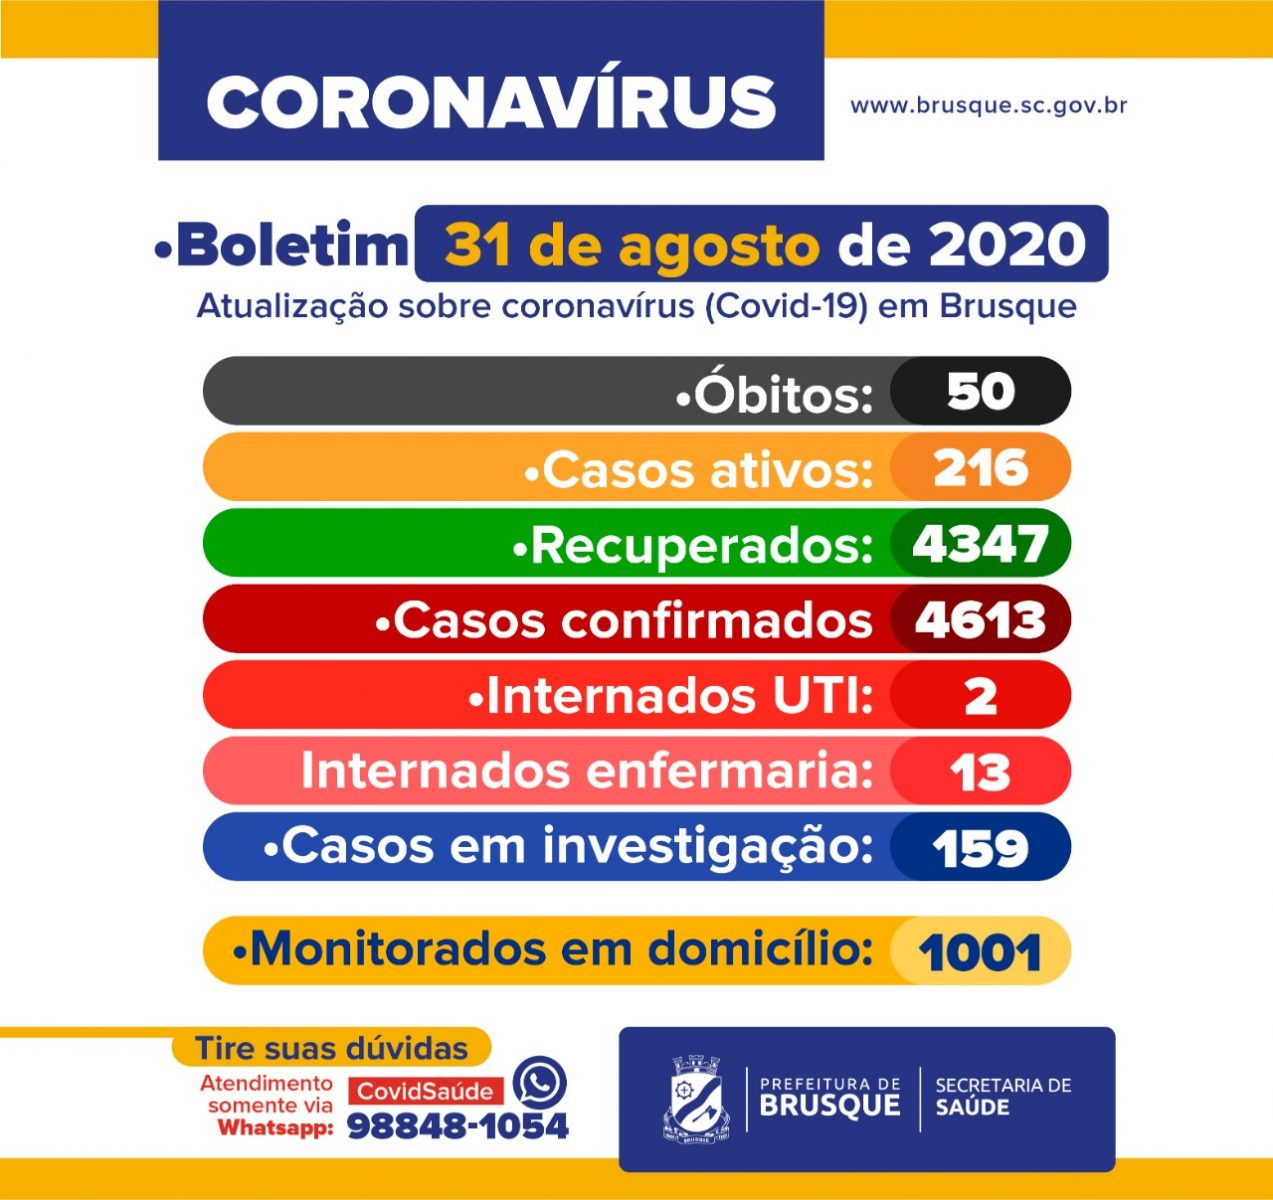 COVID-19: Boletim epidemiológico desta segunda (31) de agosto